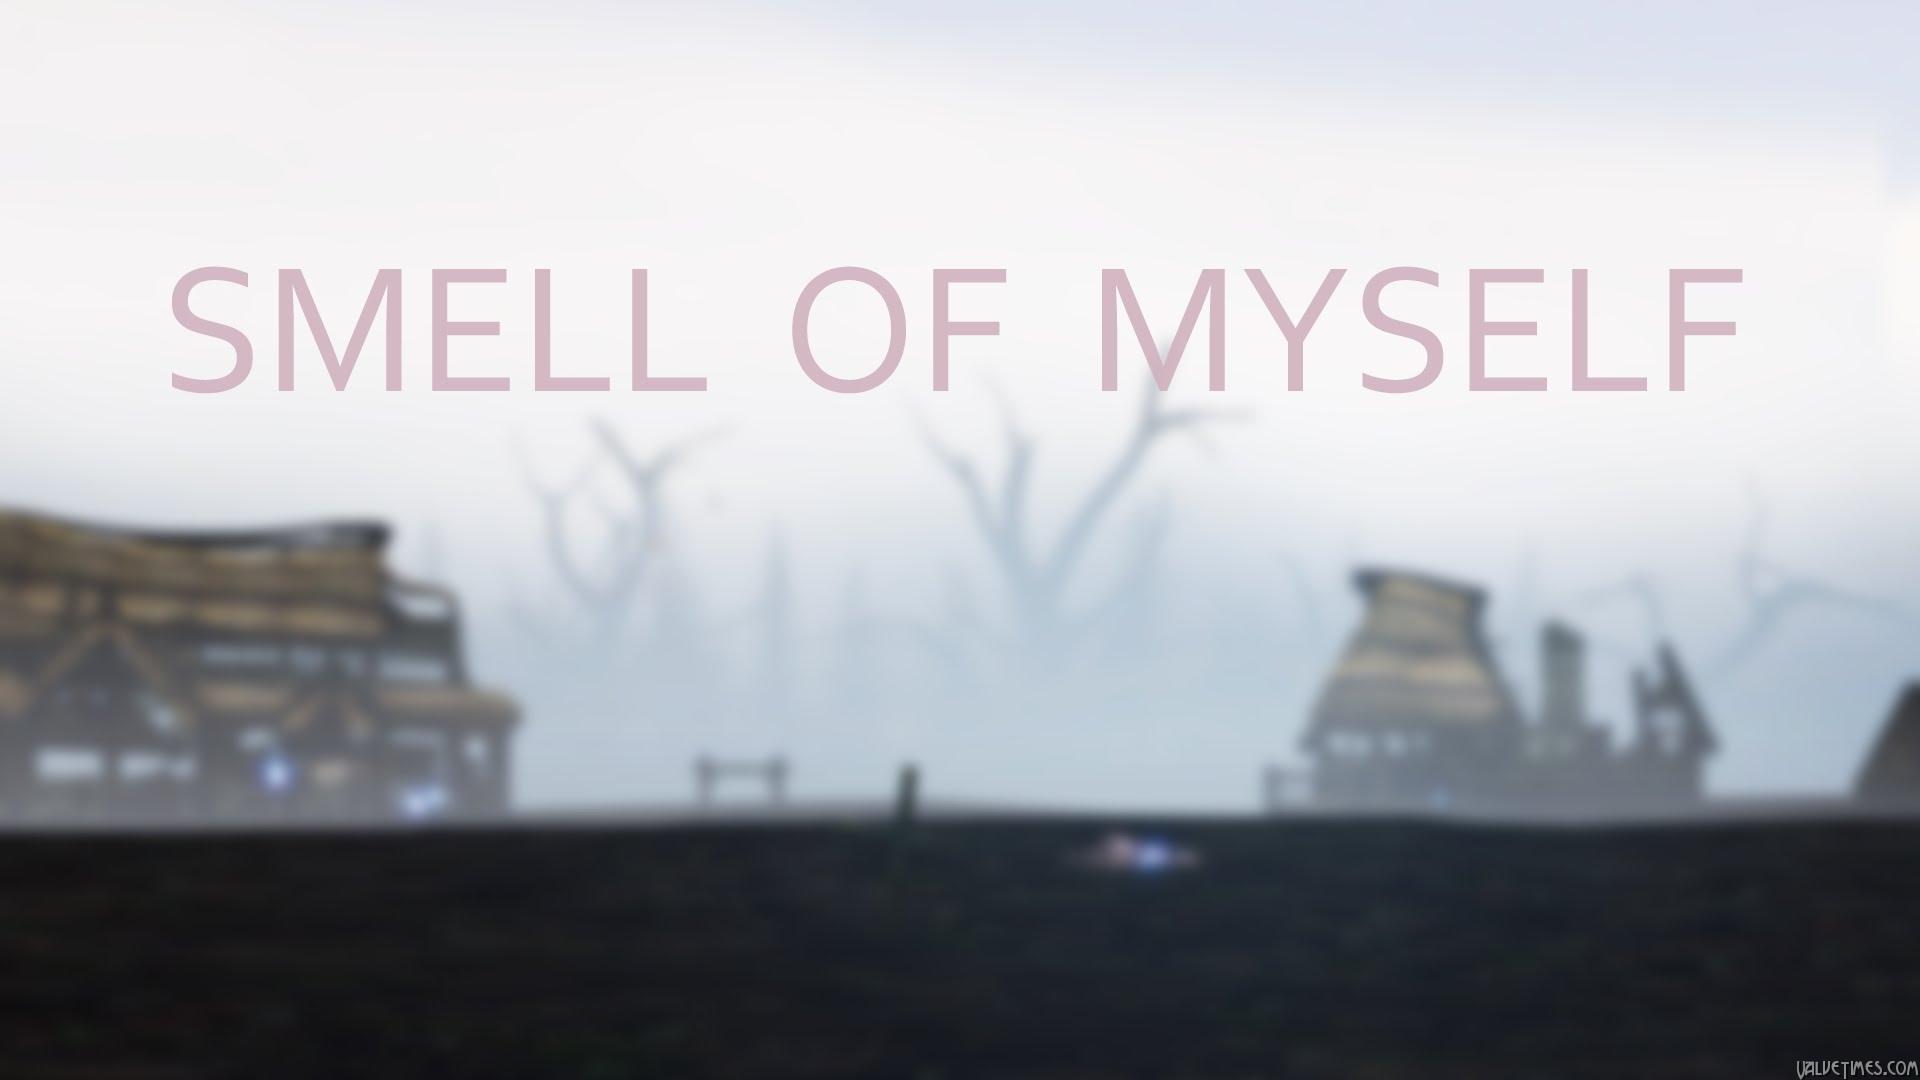 SFM: Smell of Myself